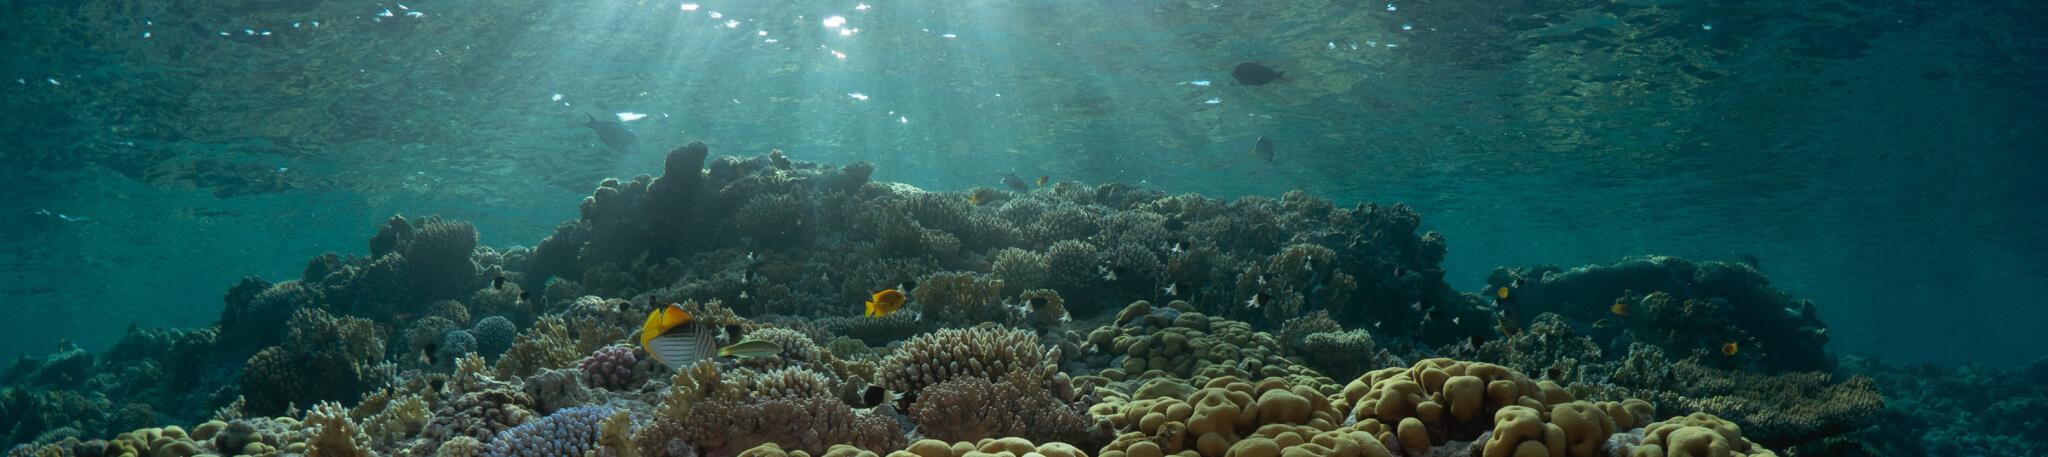 Scuba Travel, Dappled light, Red Sea, Sunbeams